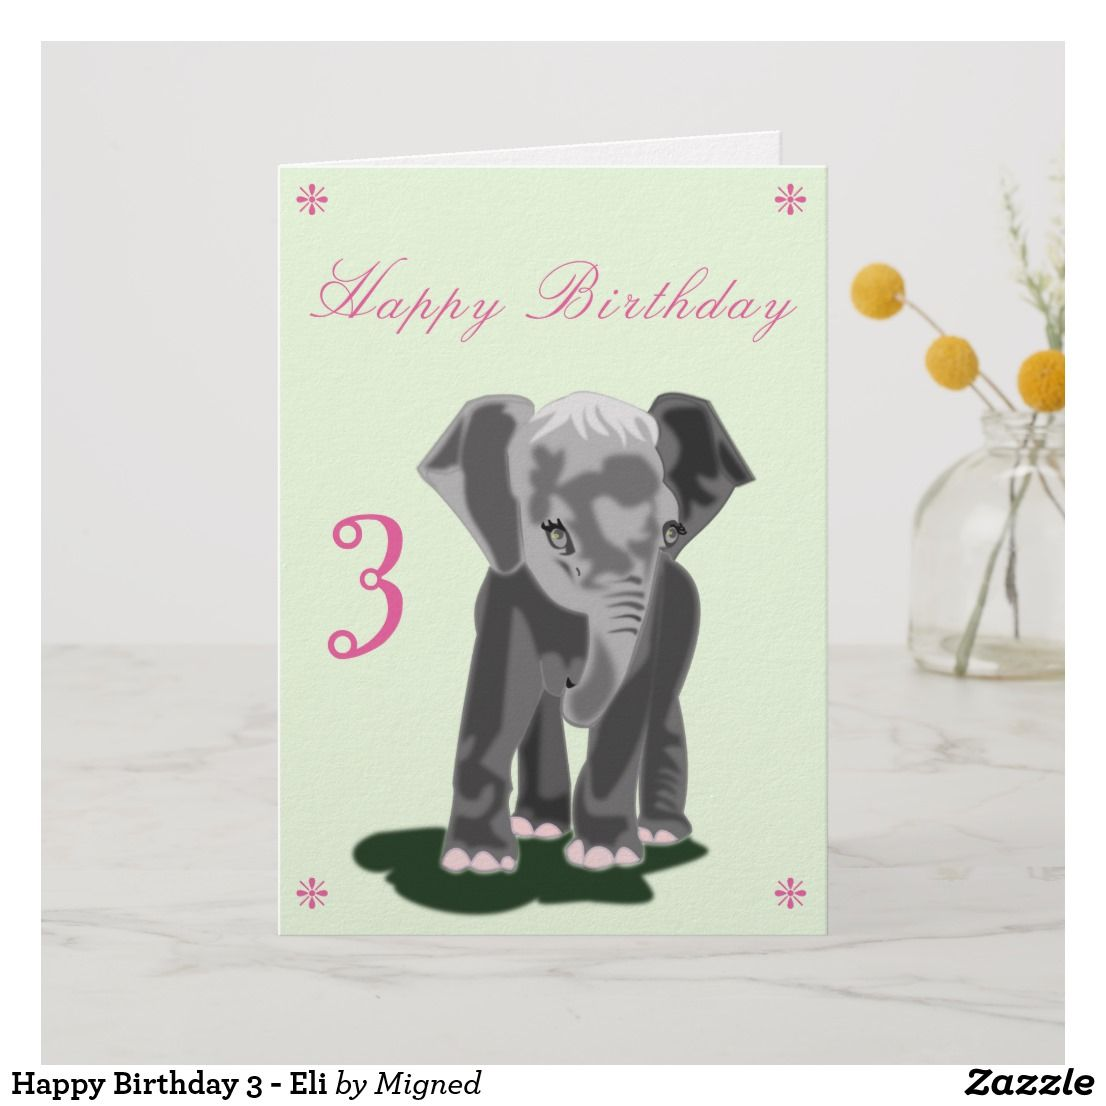 Happy birthday 3 eli card